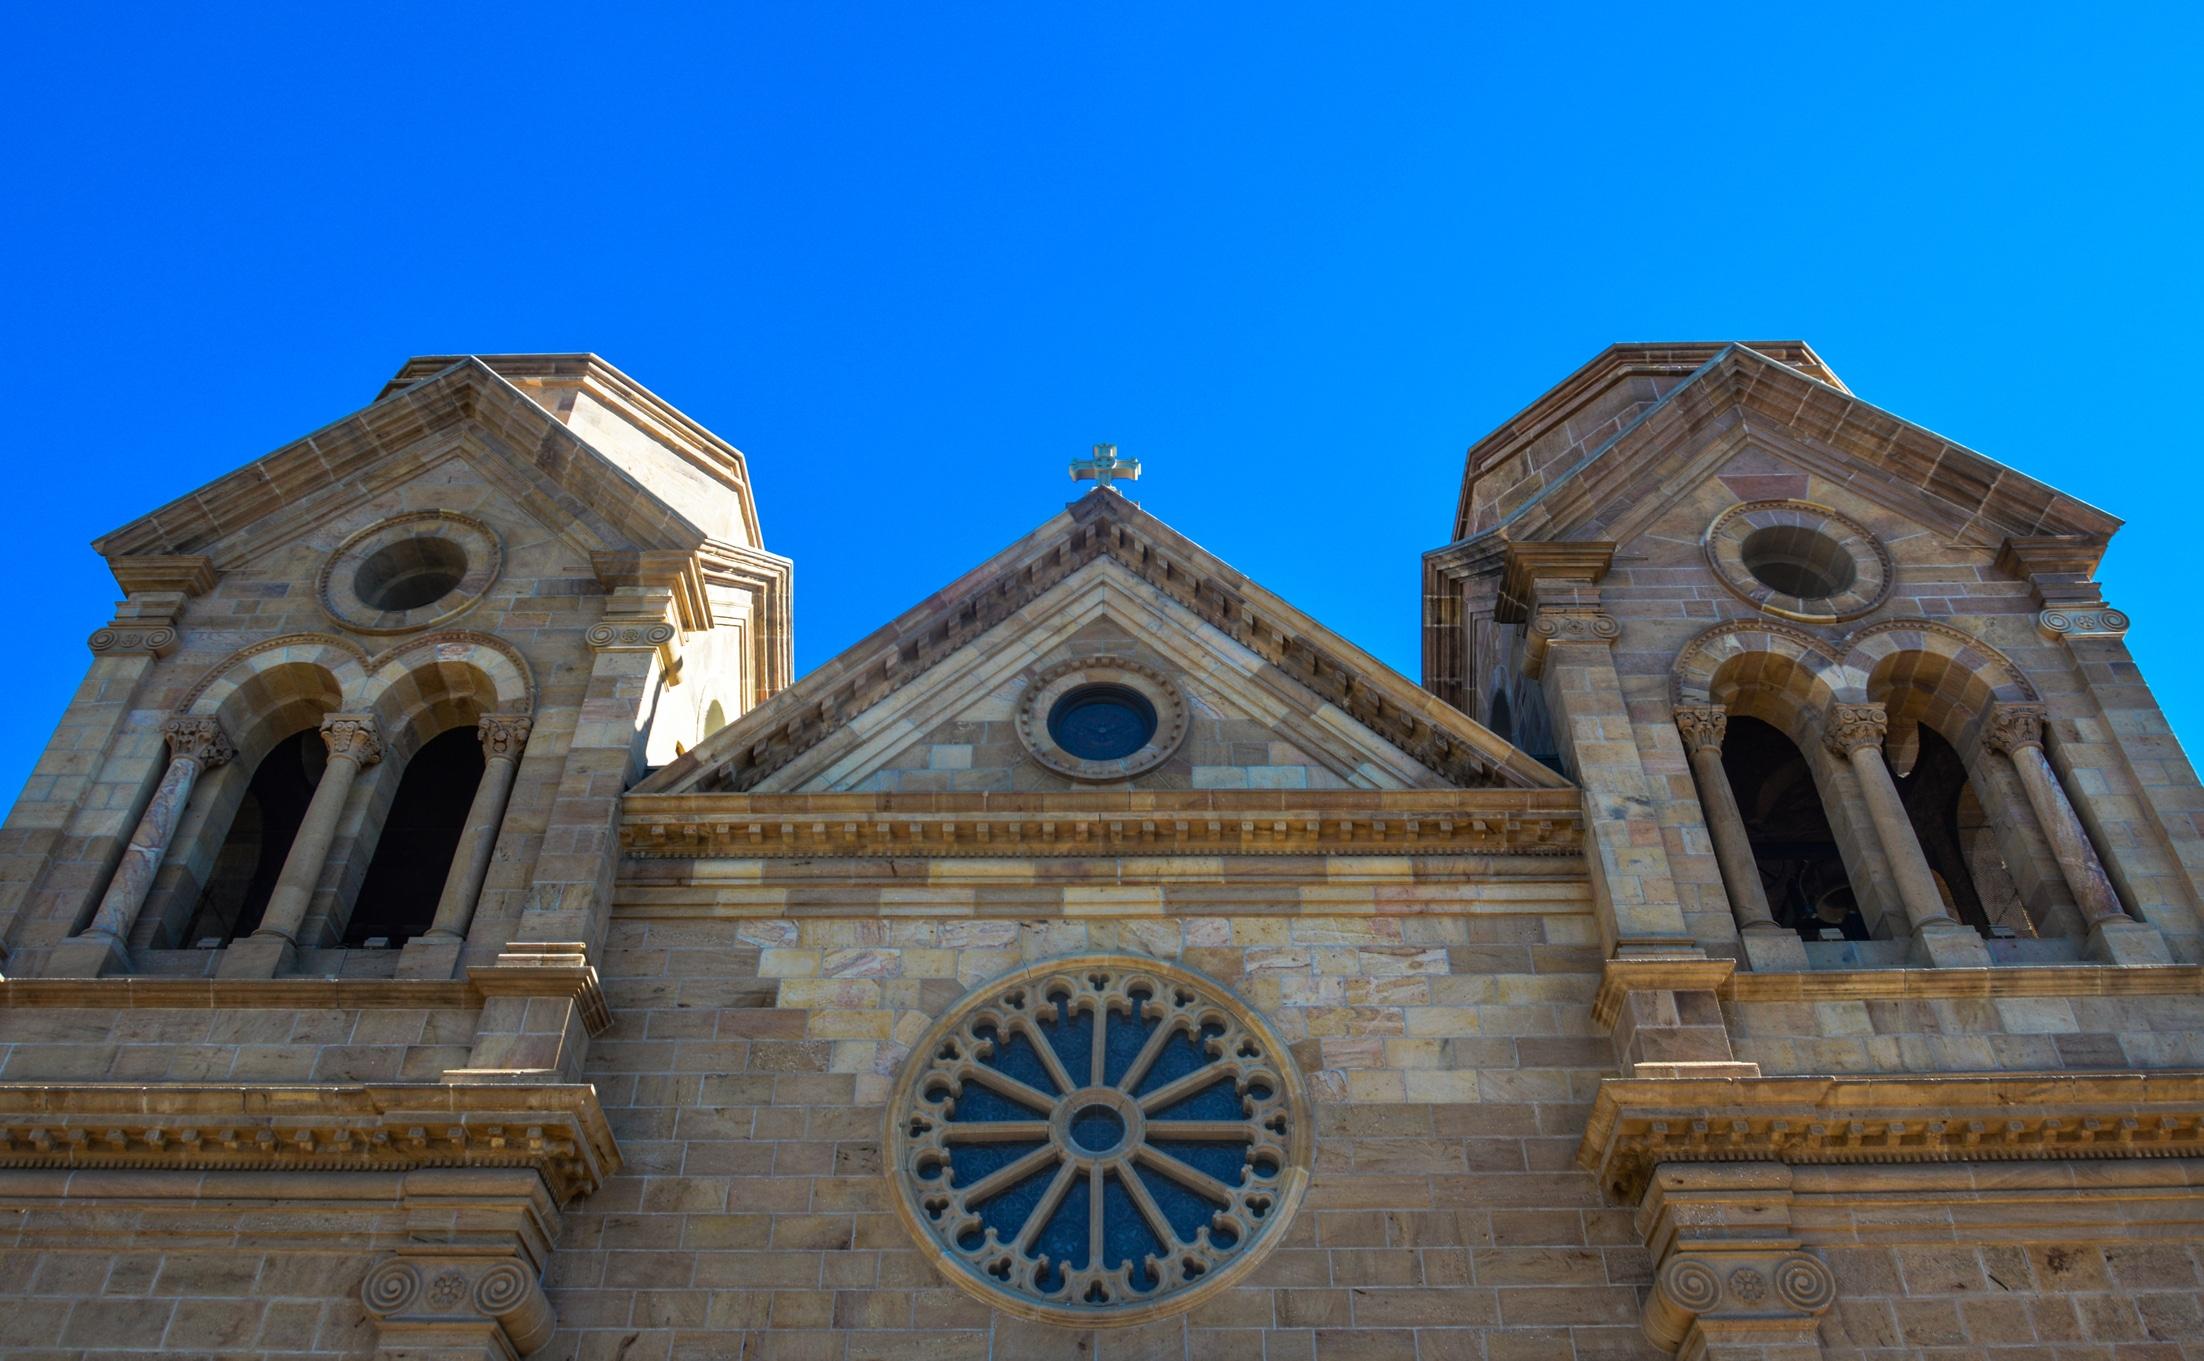 Santa Fe, New Mexico - St. Francis Cathedral Exterior